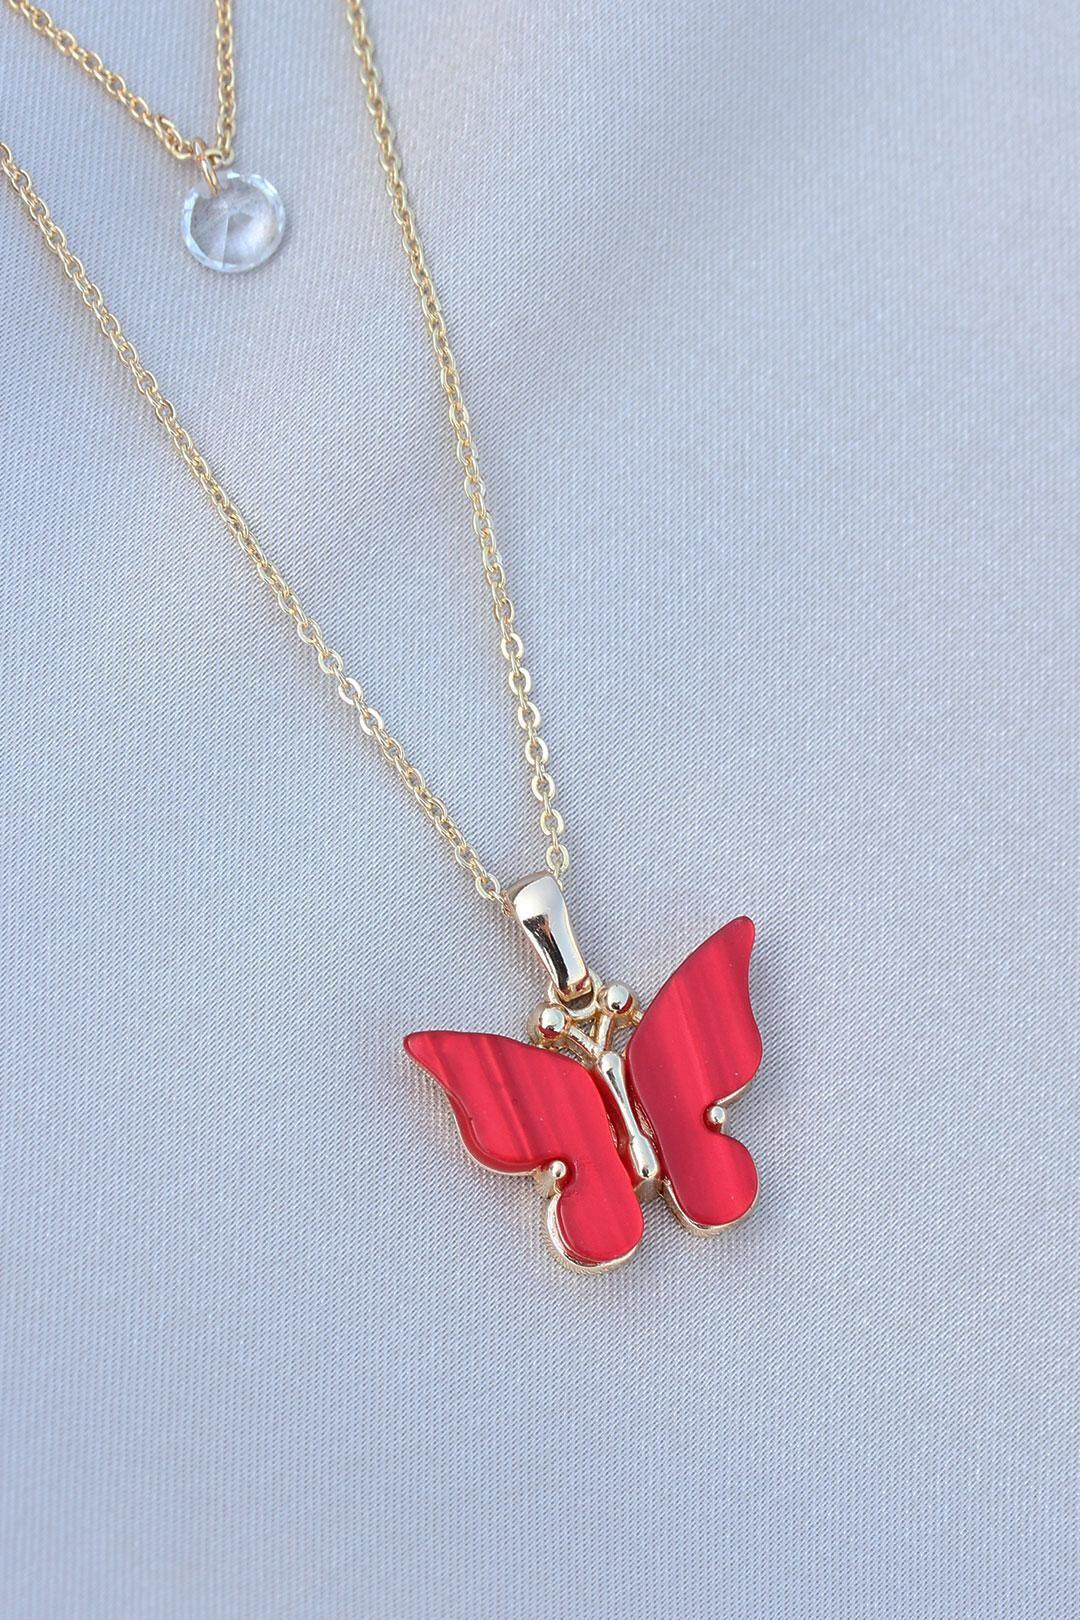 Kırmızı Kelebek Model Gold Renk Çift Zincir Kolye